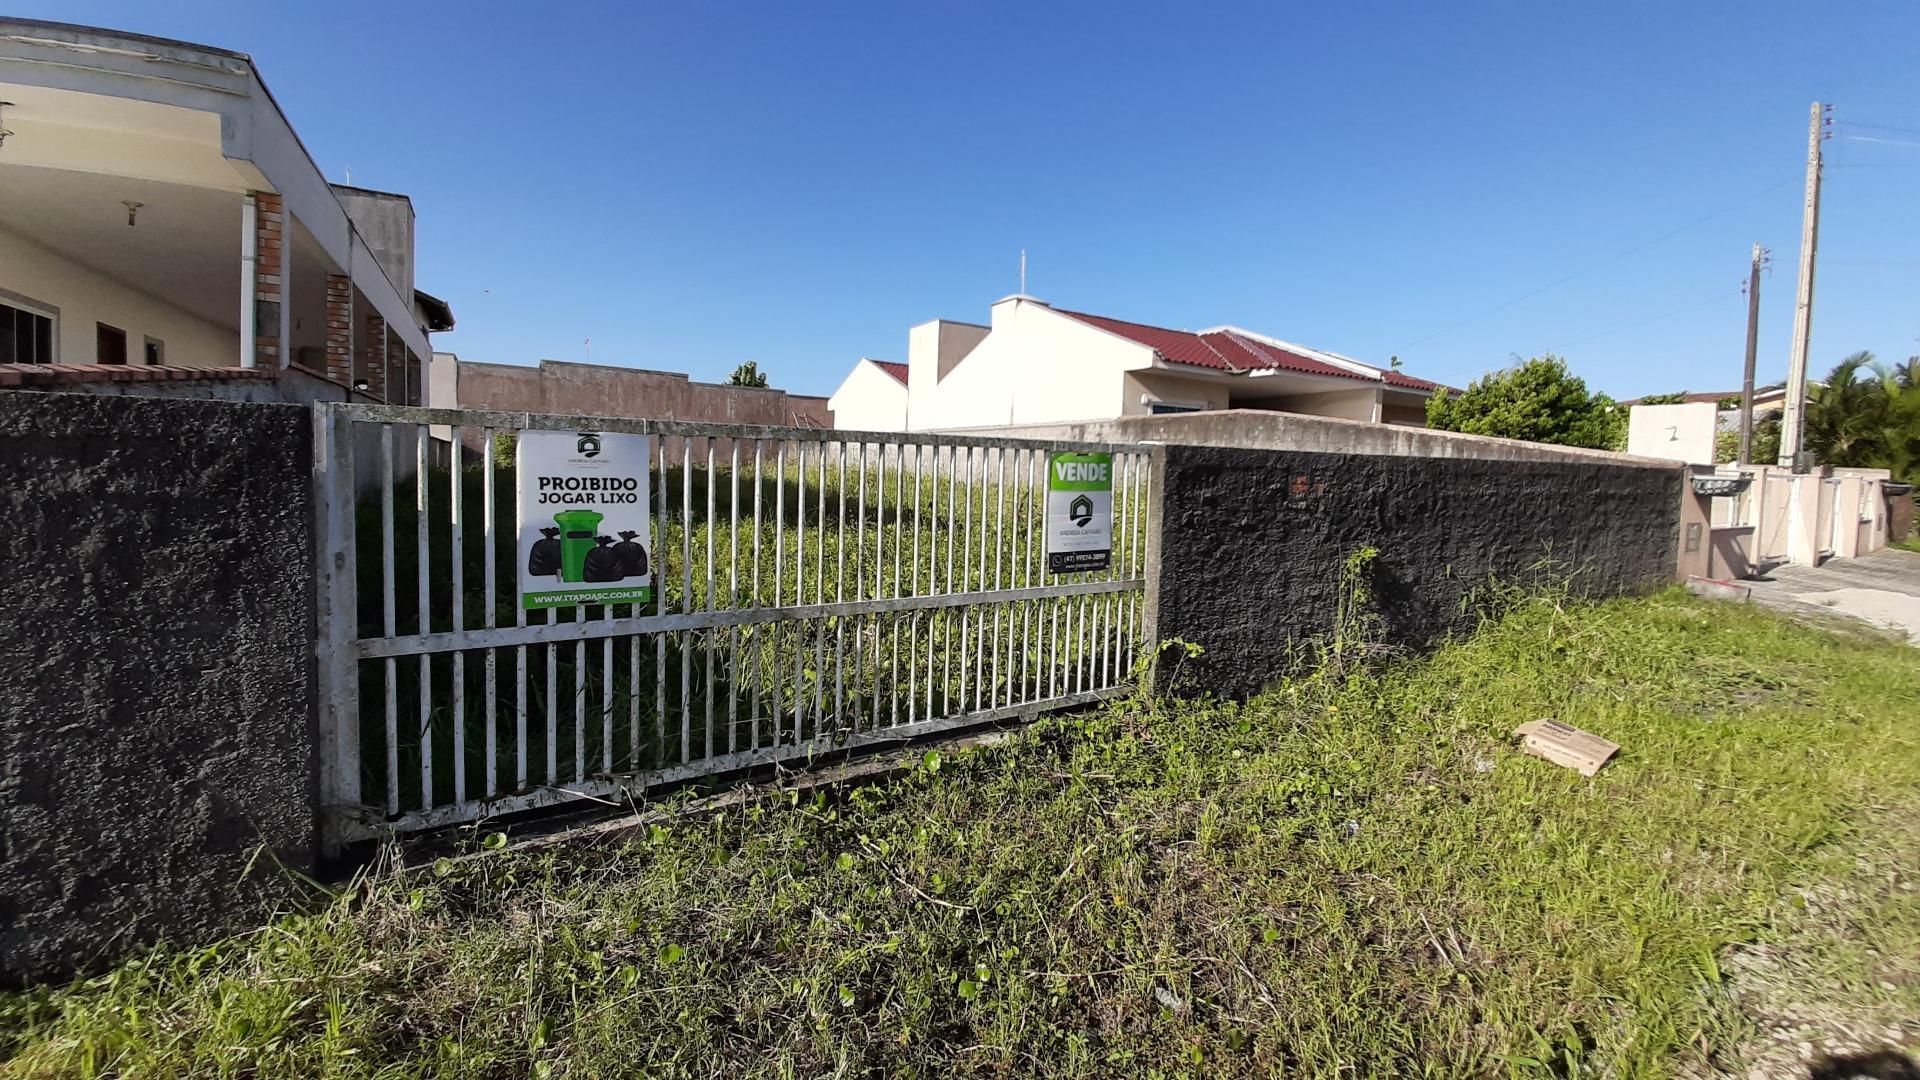 Terreno à venda, 360 m² por R$ 150.000,00 - Itapema do Sai II - Itapoá/SC